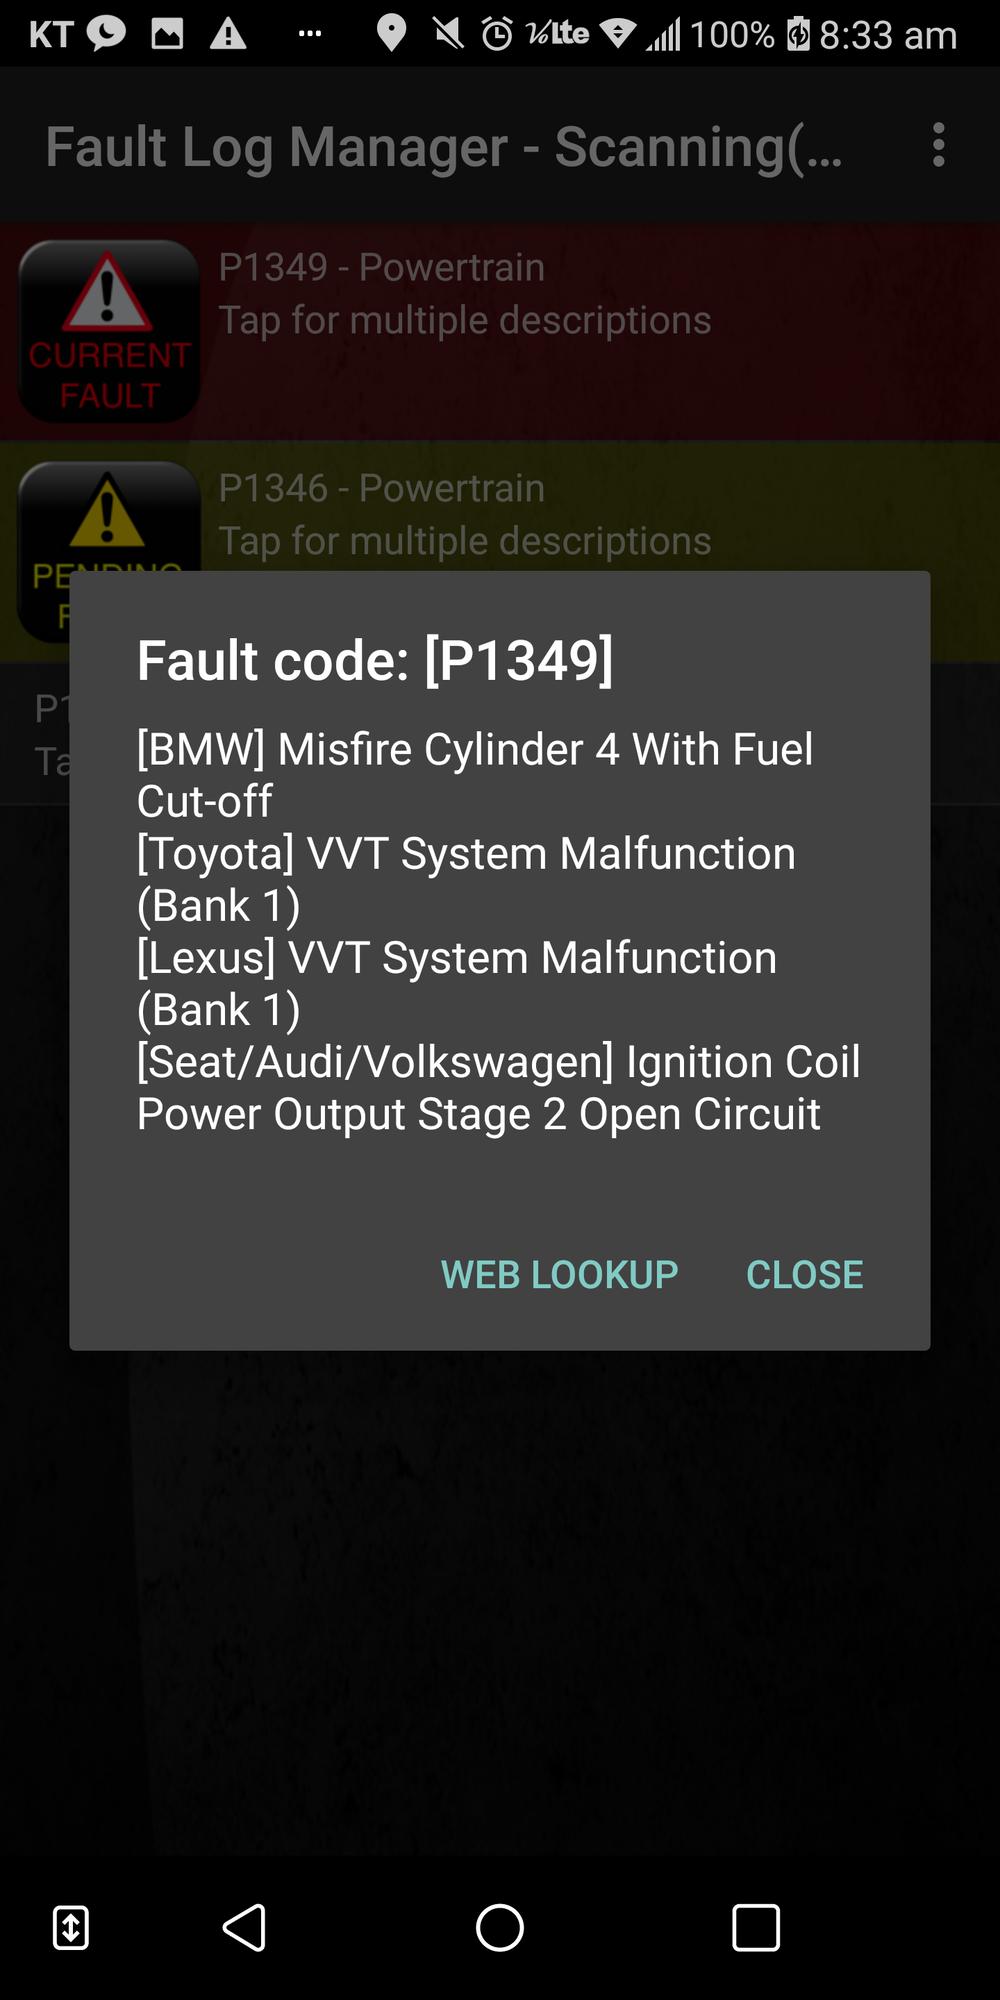 Toyota Fault Code 33